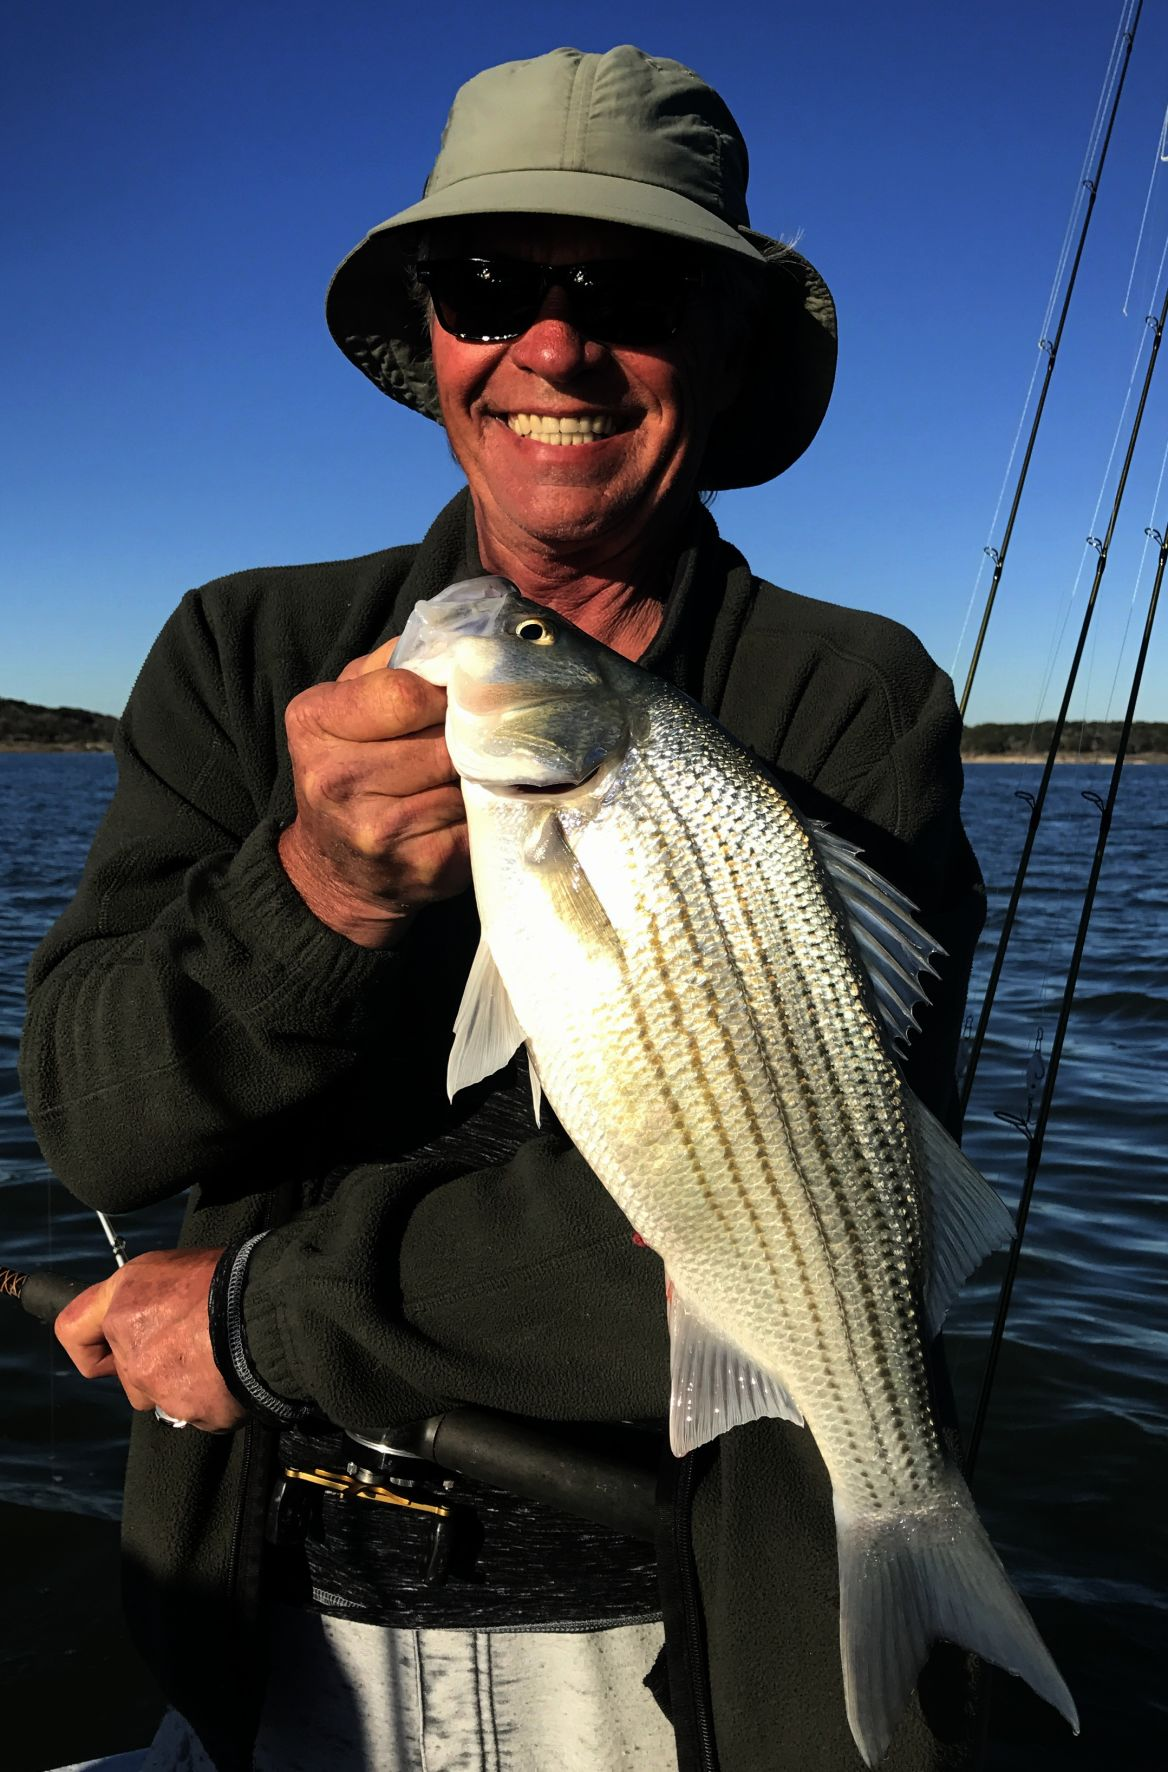 Bob Maindelle Guide Lines Feb. 26